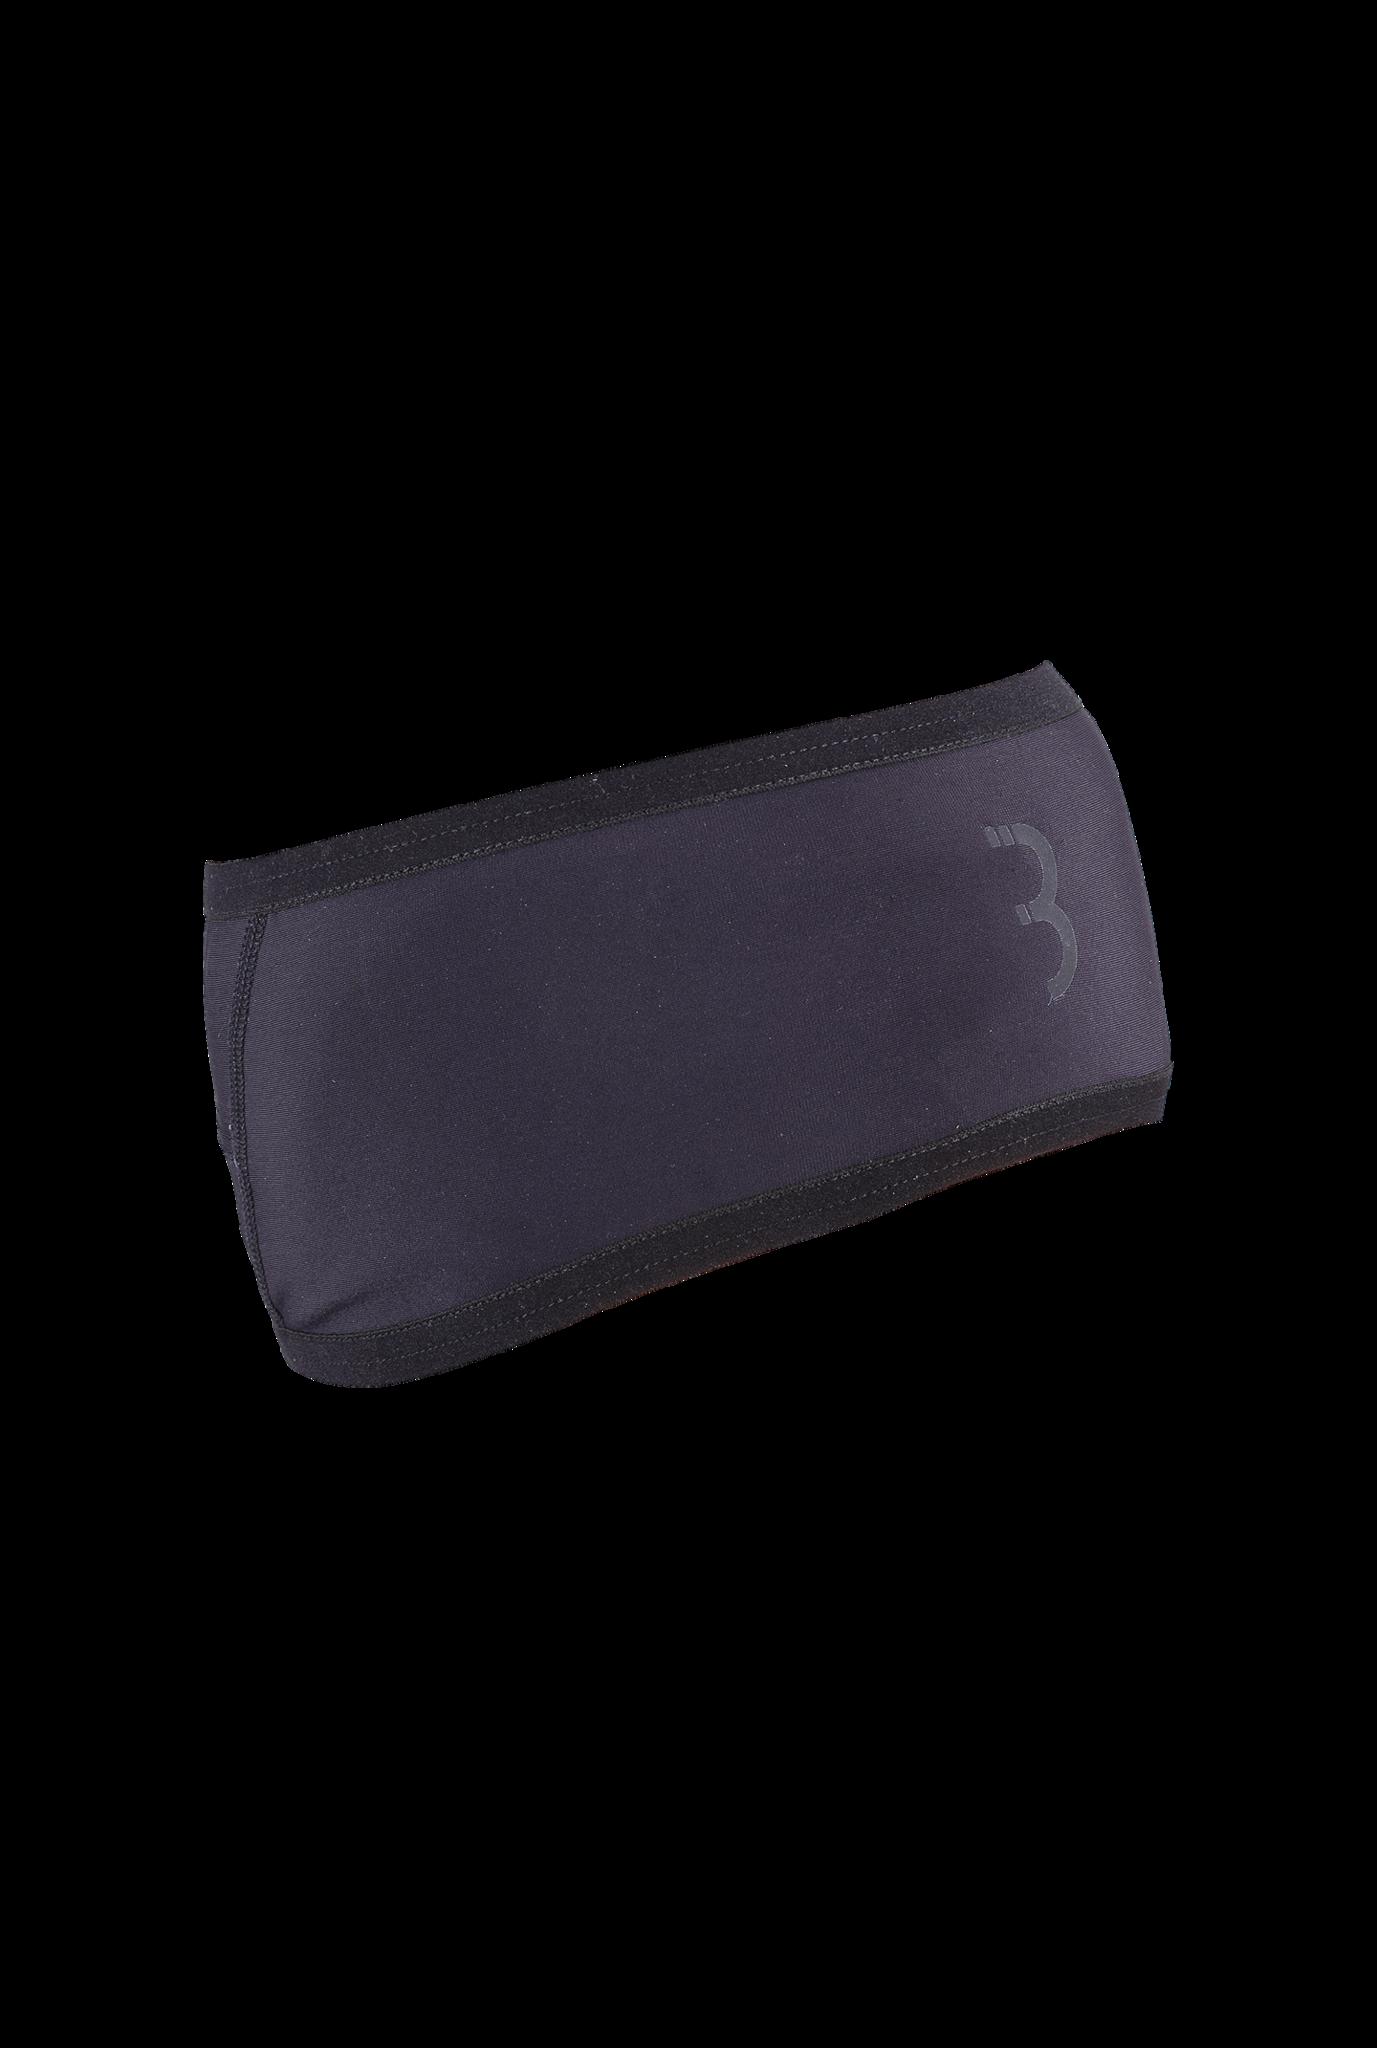 BBW-300 hoofdband Thermal zwart-1